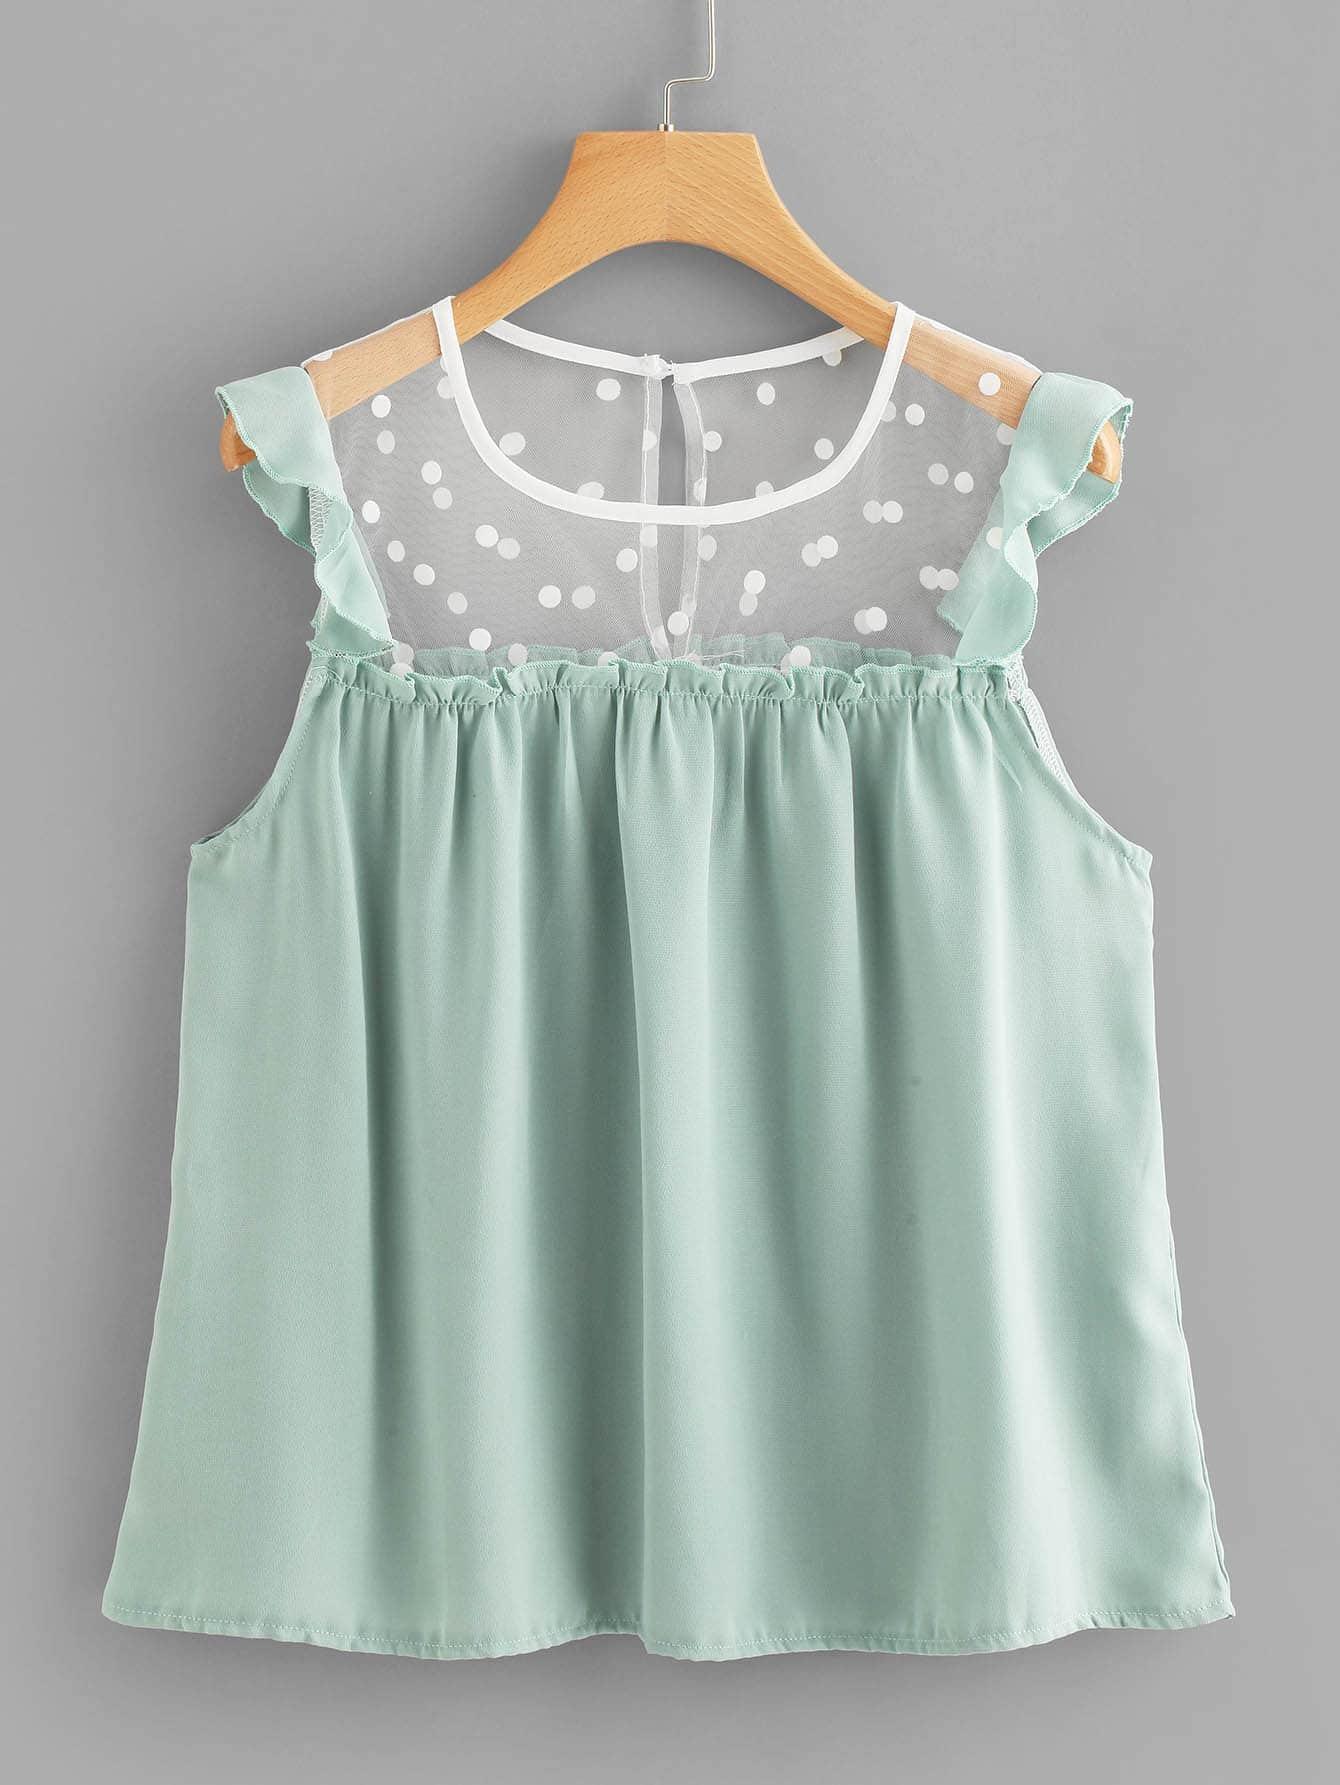 Lace Panel Polka Dot Frill Trim Top girls frill trim polka dot dress